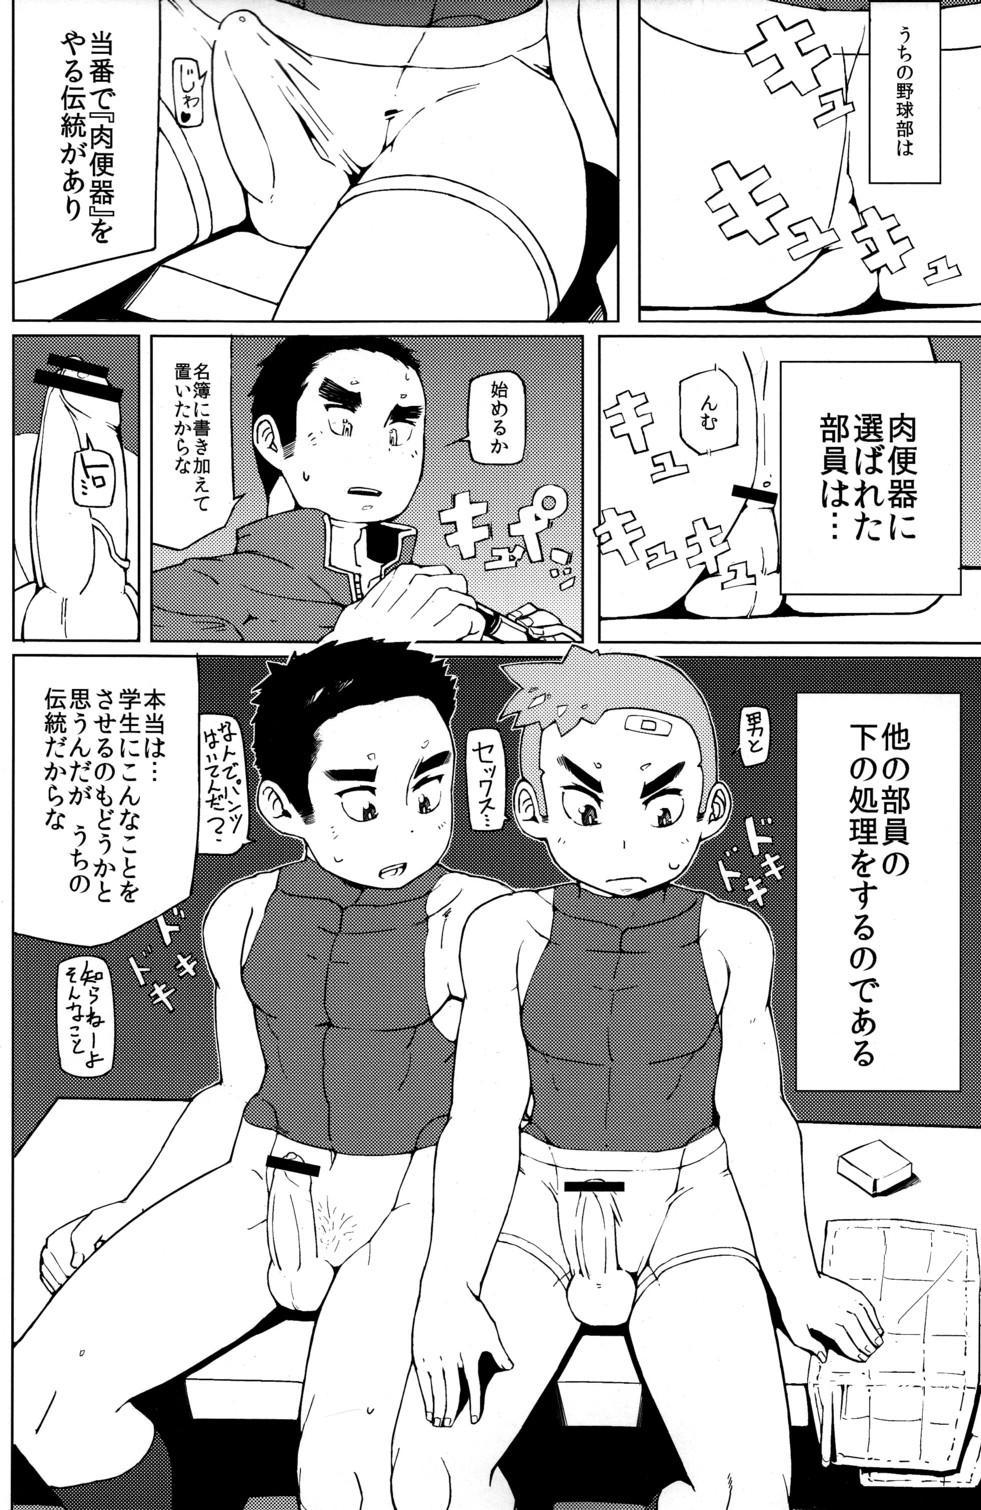 Nikubenki Yakyuubu 3